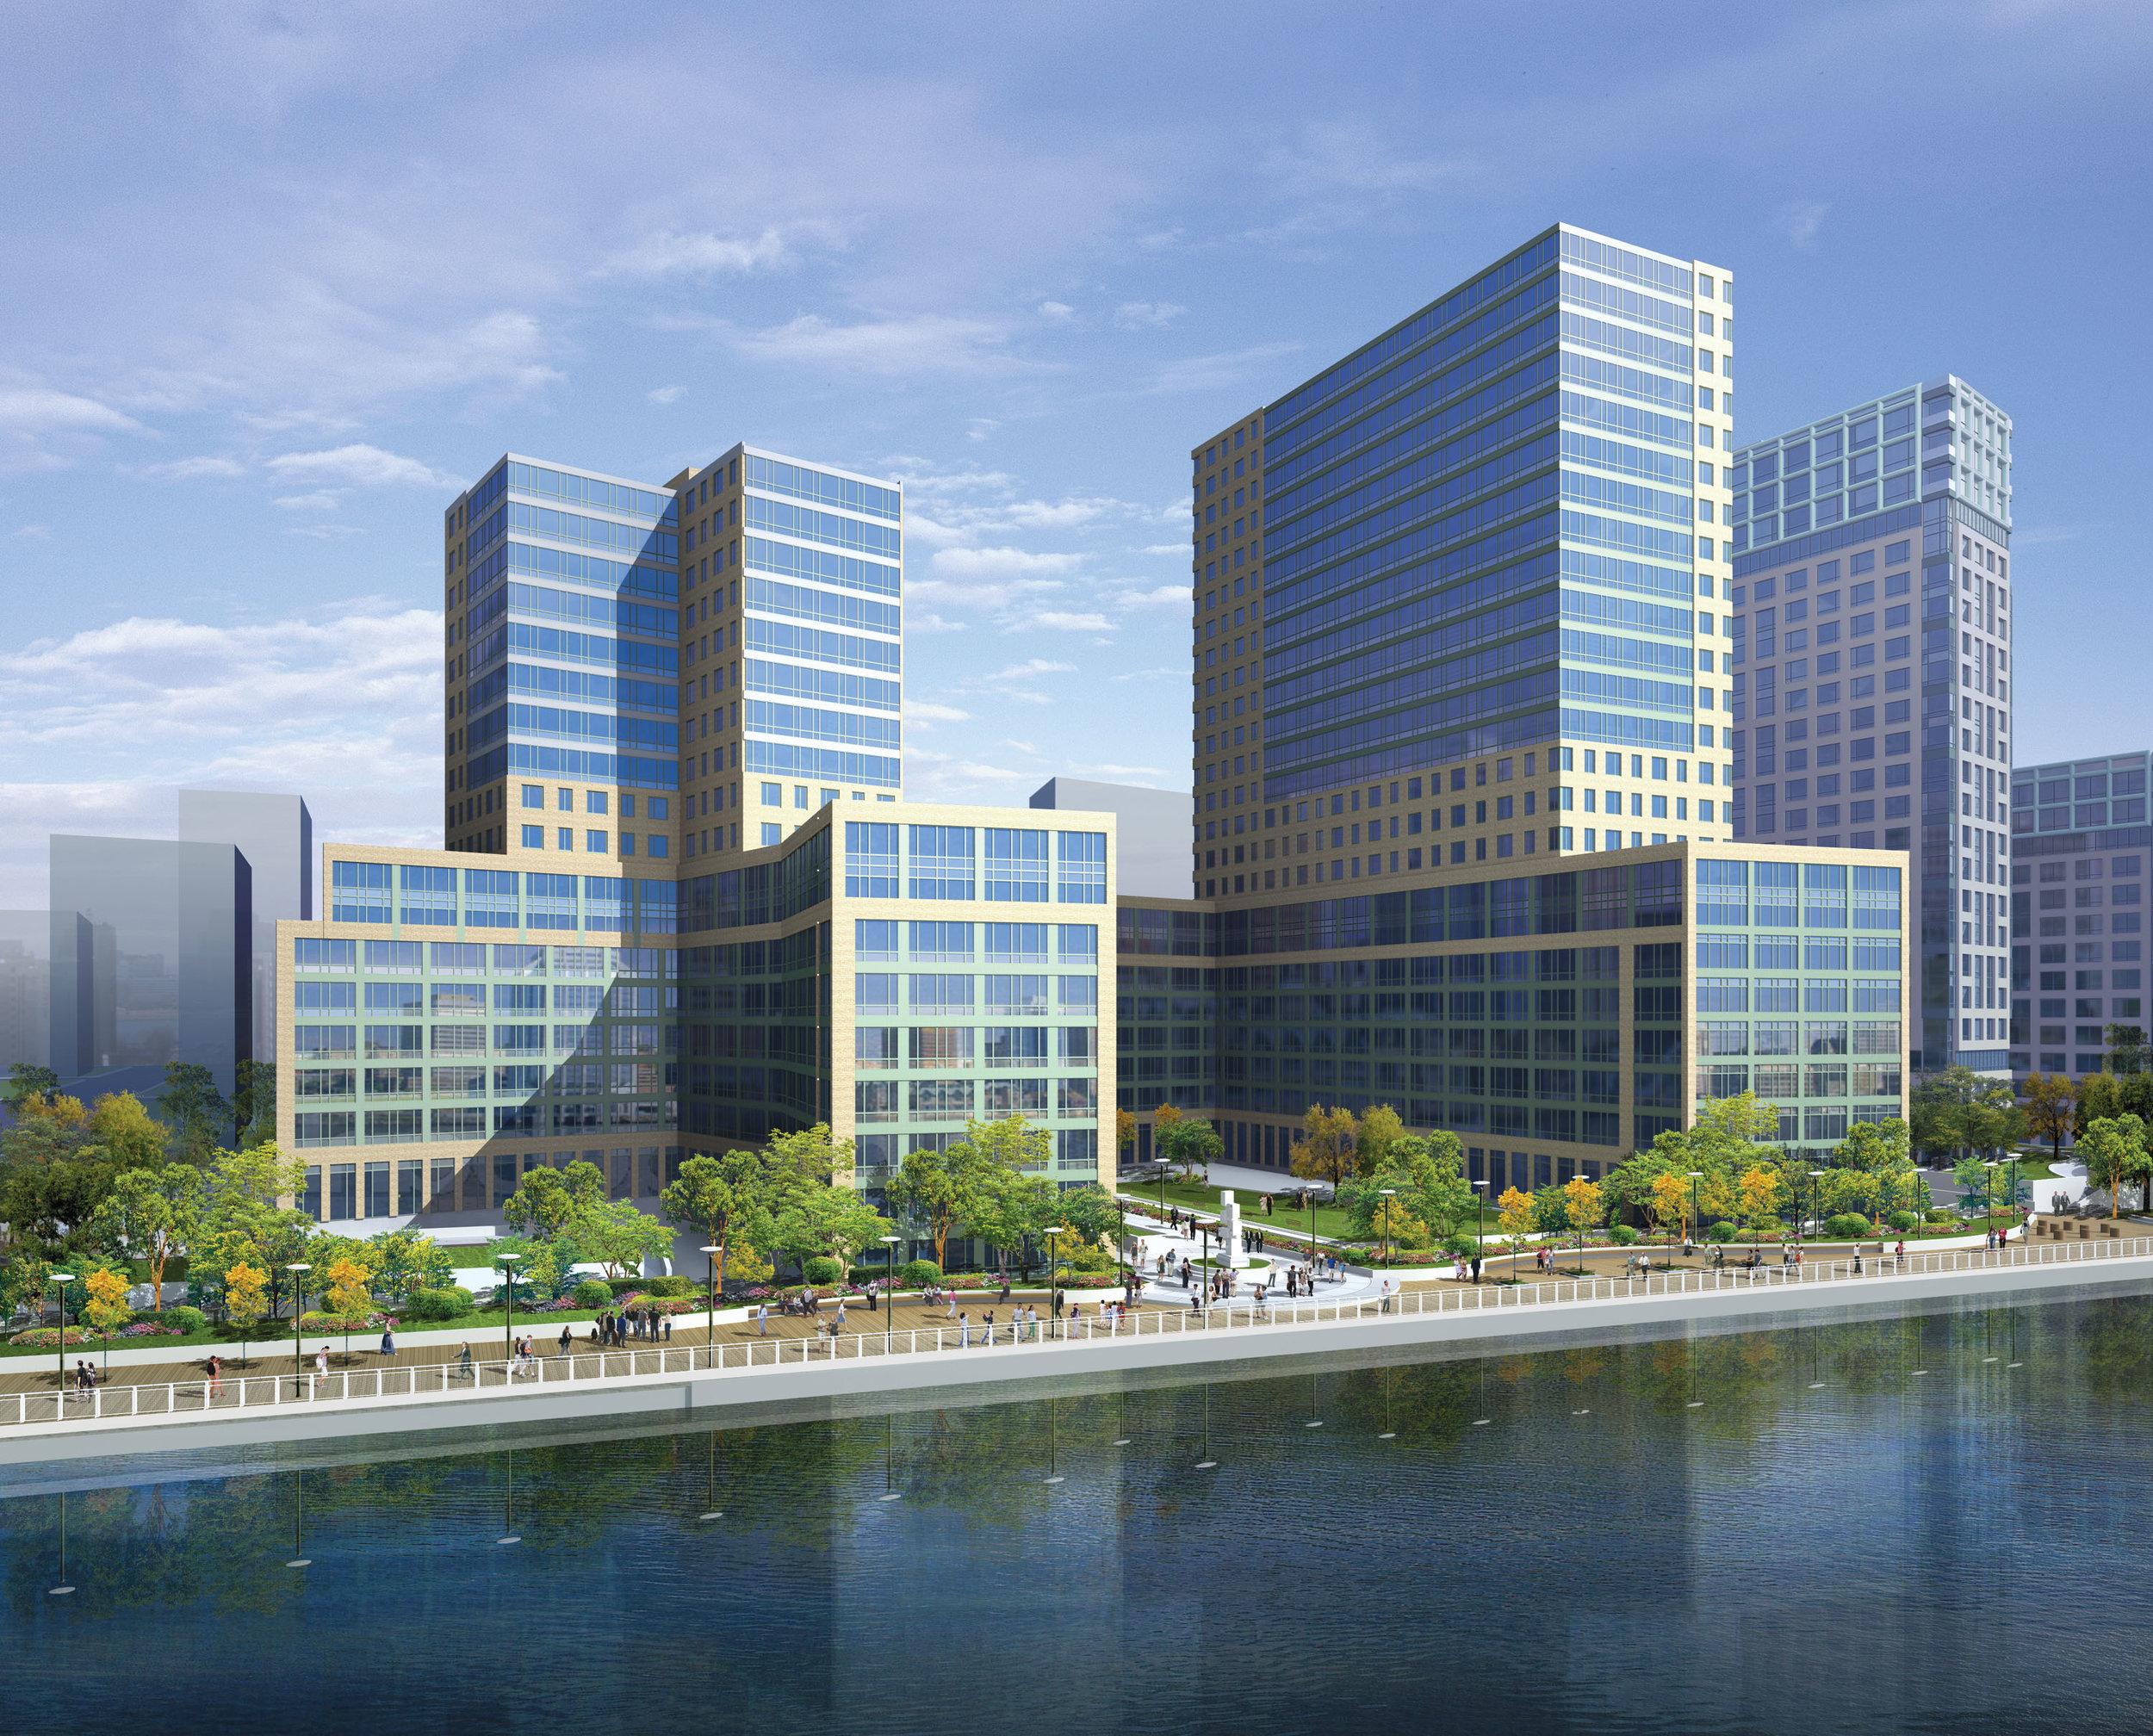 Williamsburg Waterfront Development